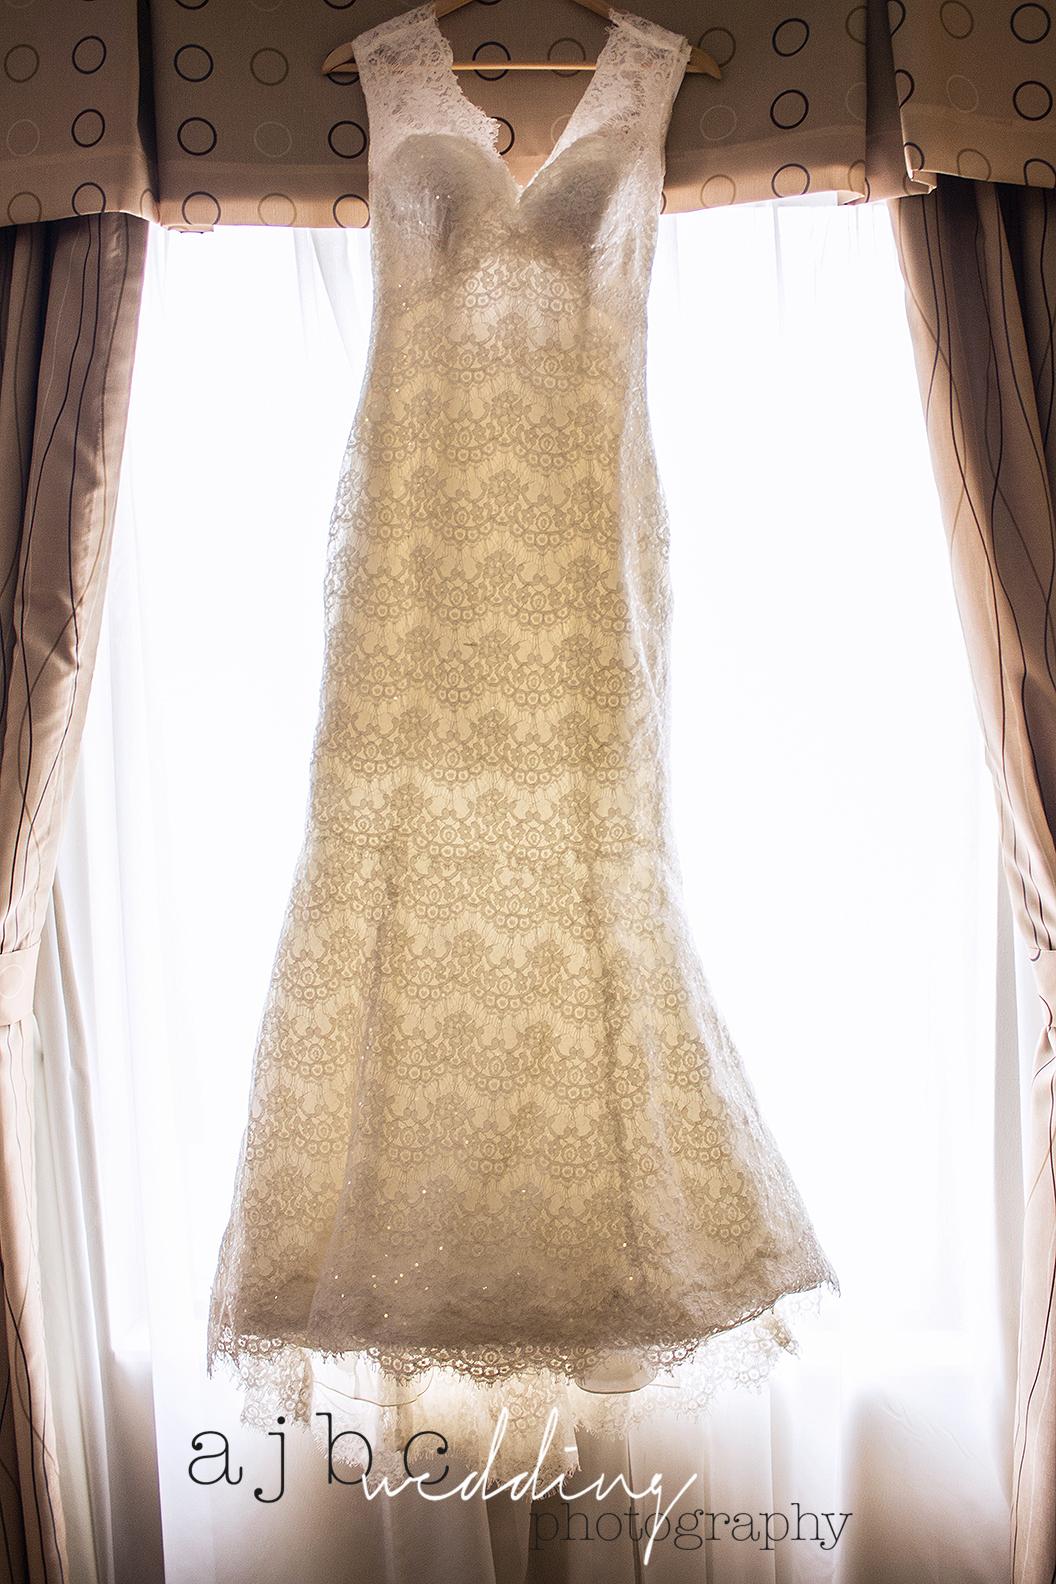 say  yes to the dress ajbcphotography-port-huron-michigan-wedding-photographer-outdoors-summer-wedding-country-wedding-wadhams-michigan-bride-groom-love-wedding-dress1.jpg